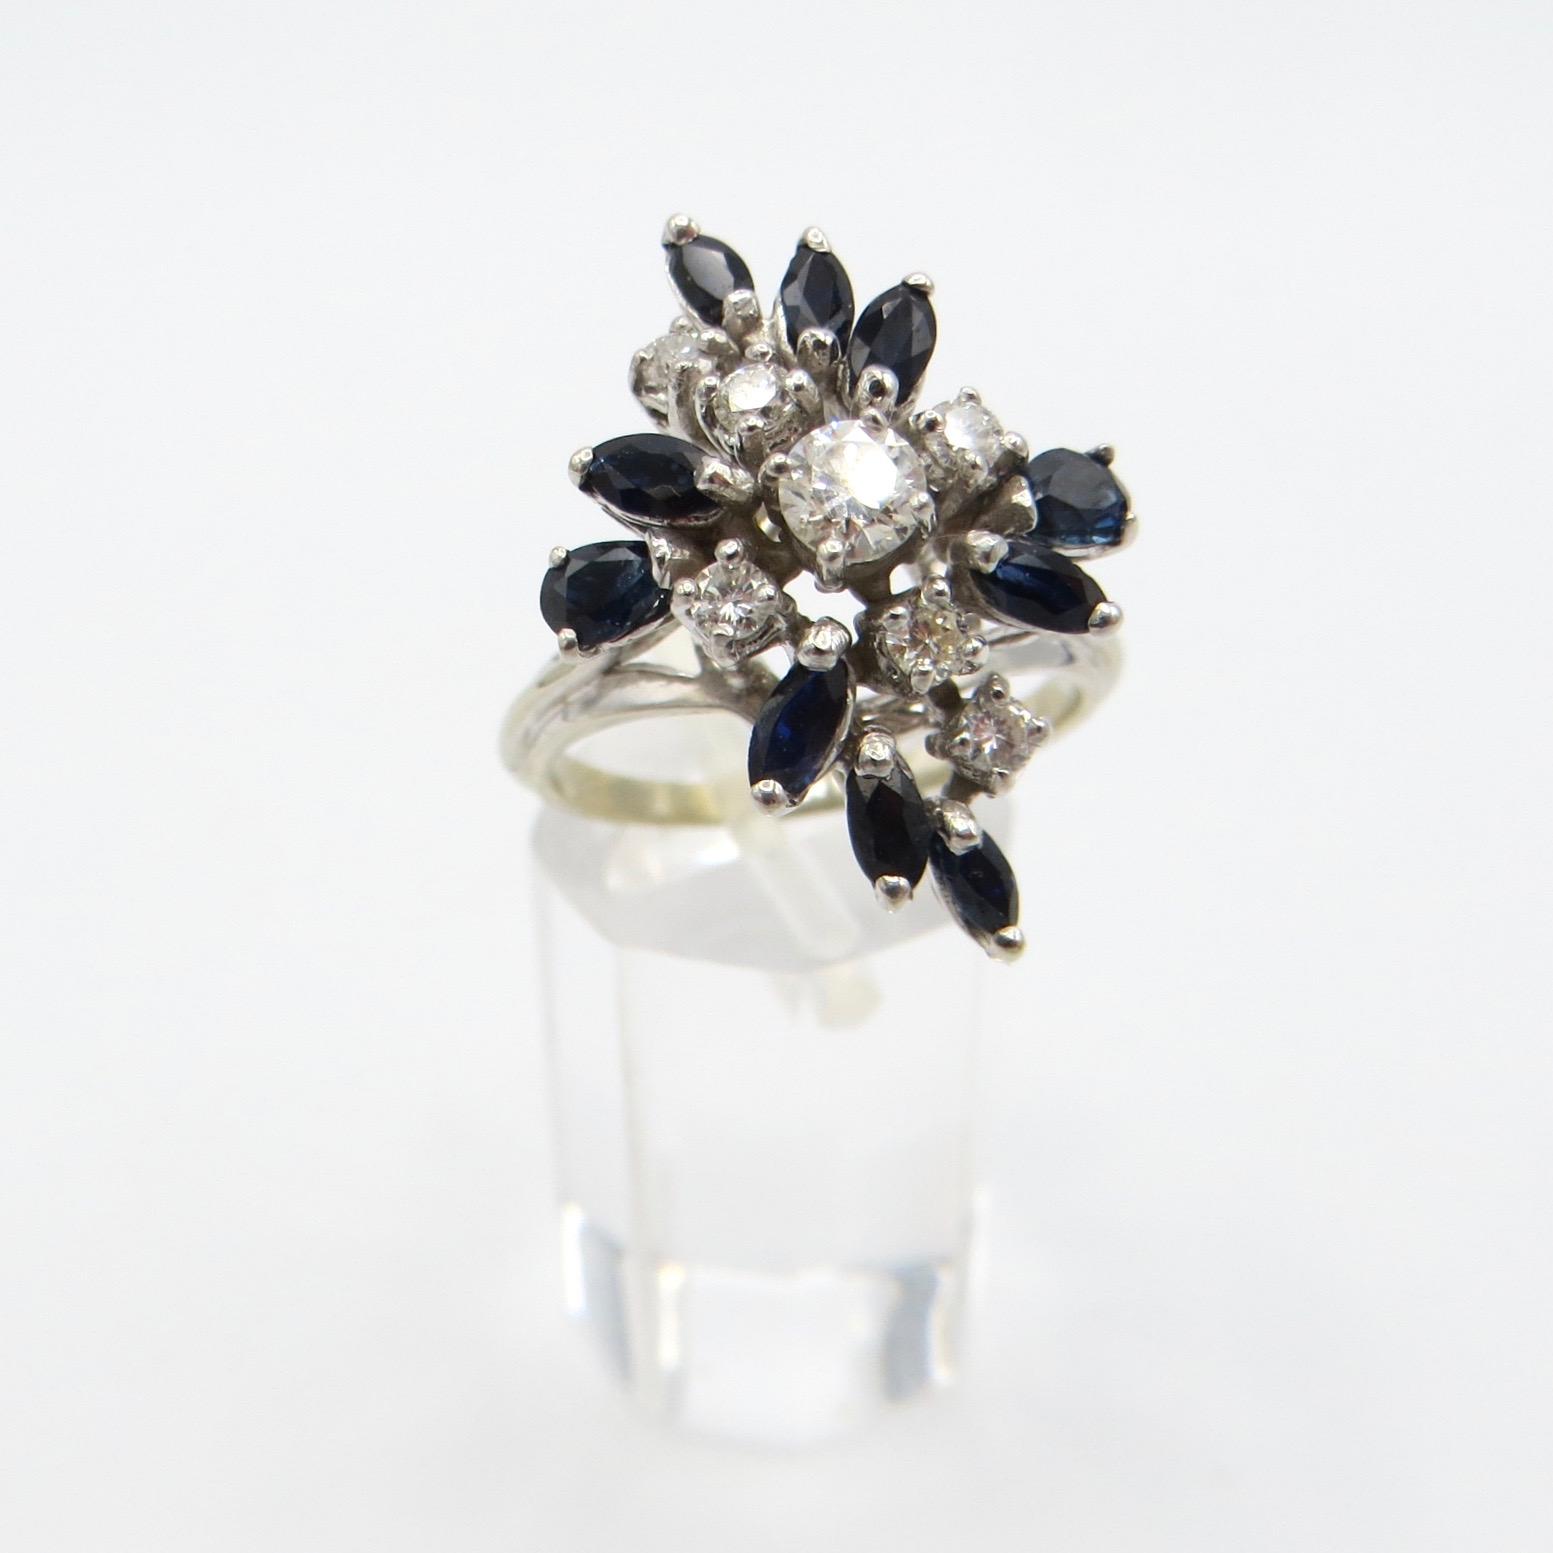 14kt White Gold, Diamond & Sapphire Ring